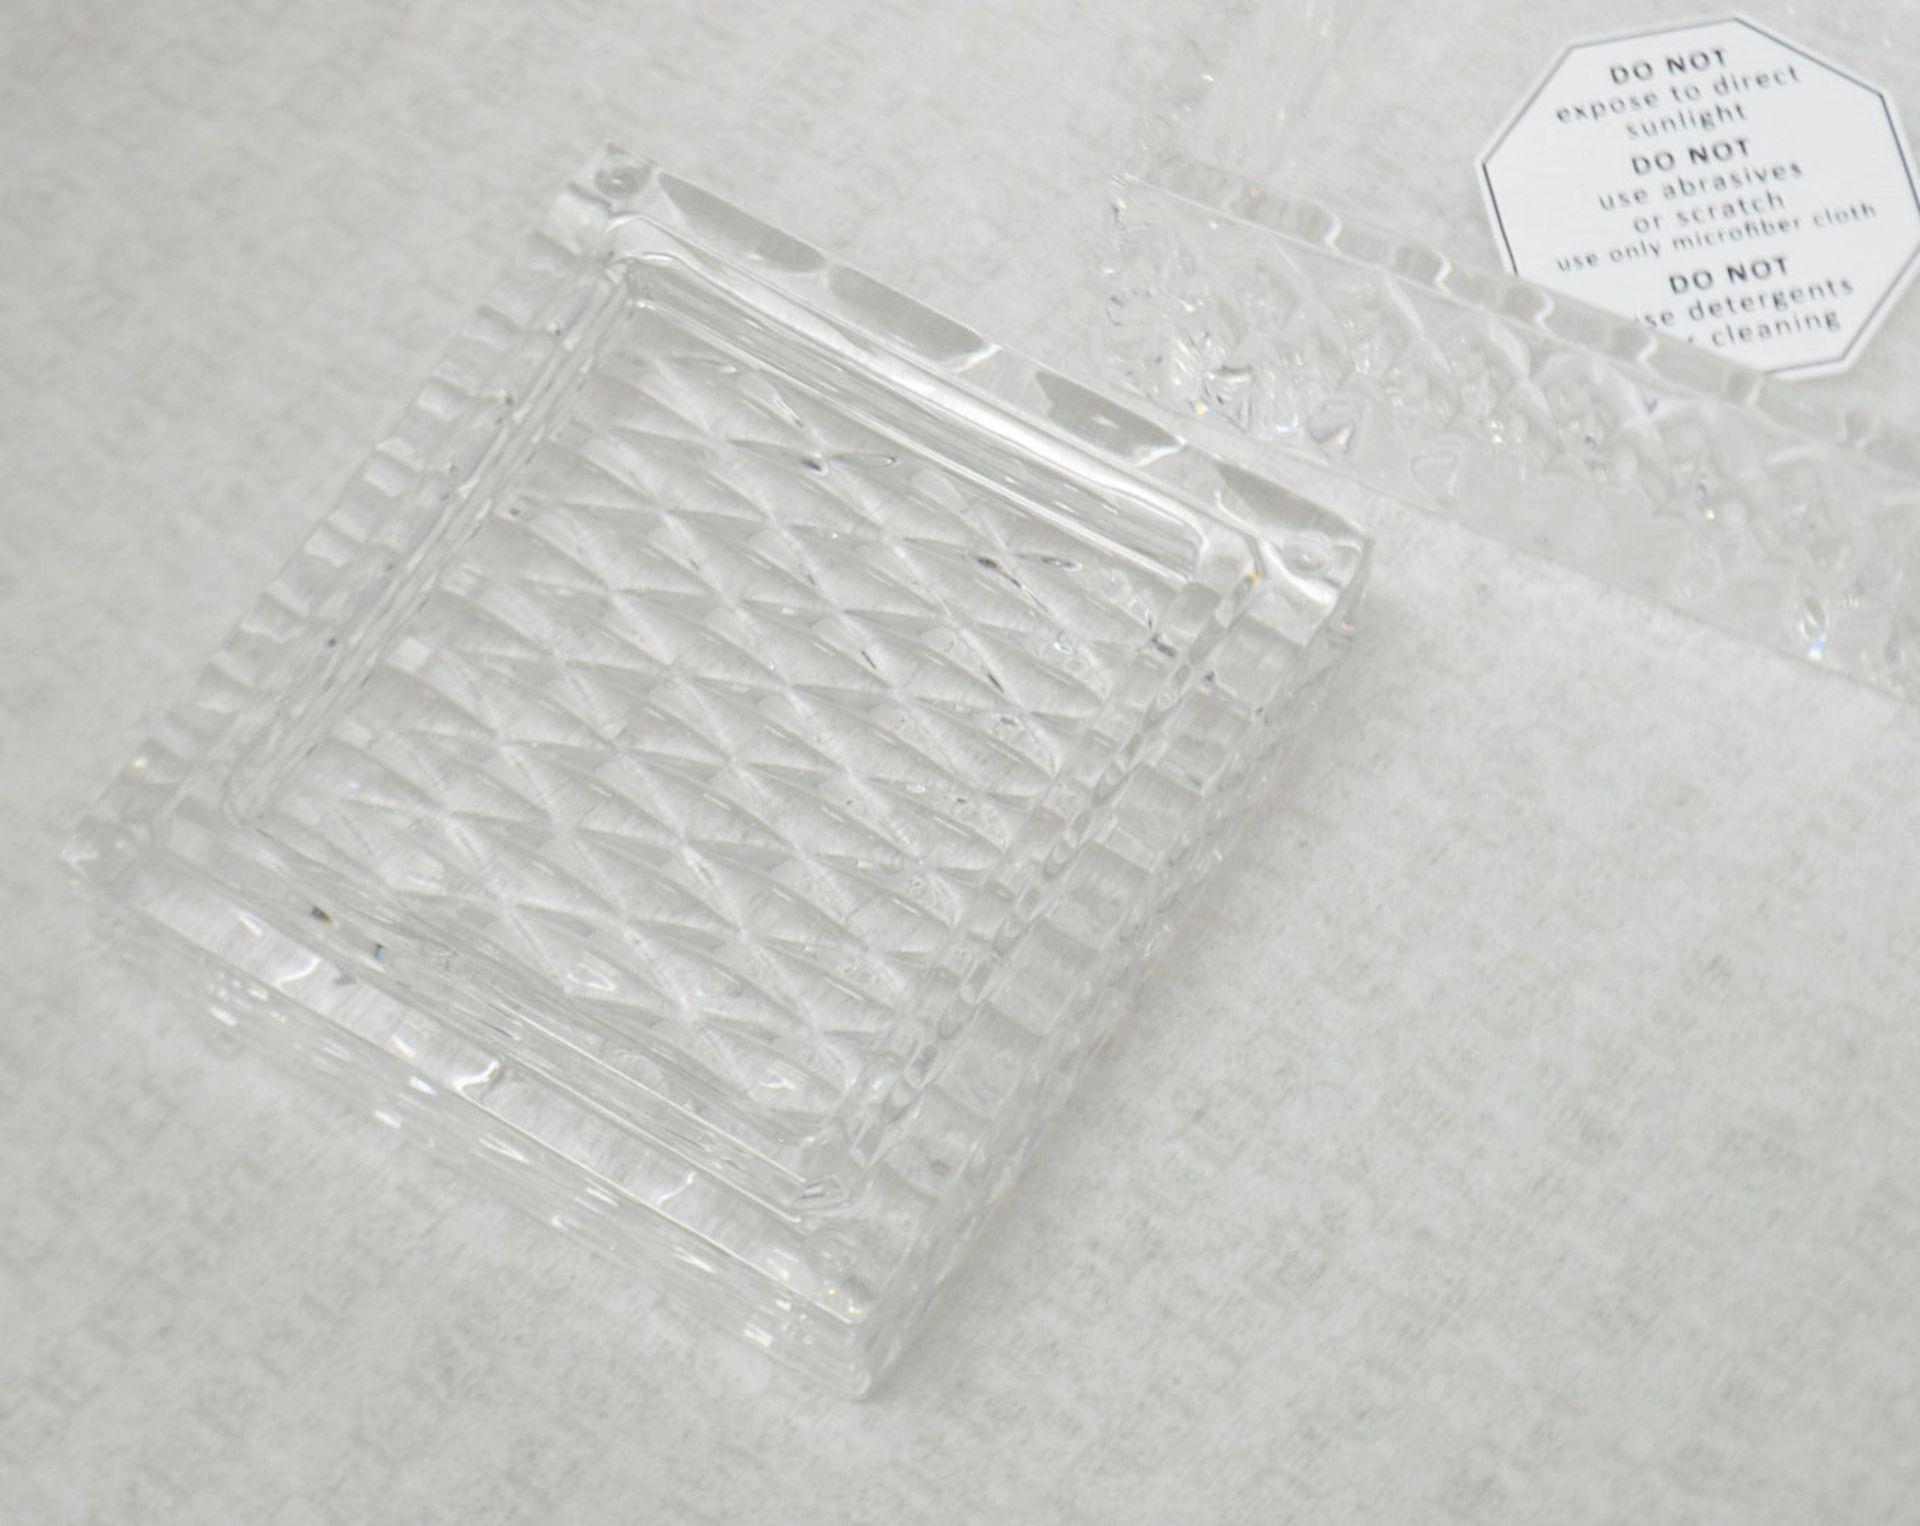 1 x BALDI 'Home Jewels' Italian Hand-crafted Artisan Clear Diamond Crystal Perfume Box, With A - Image 3 of 5